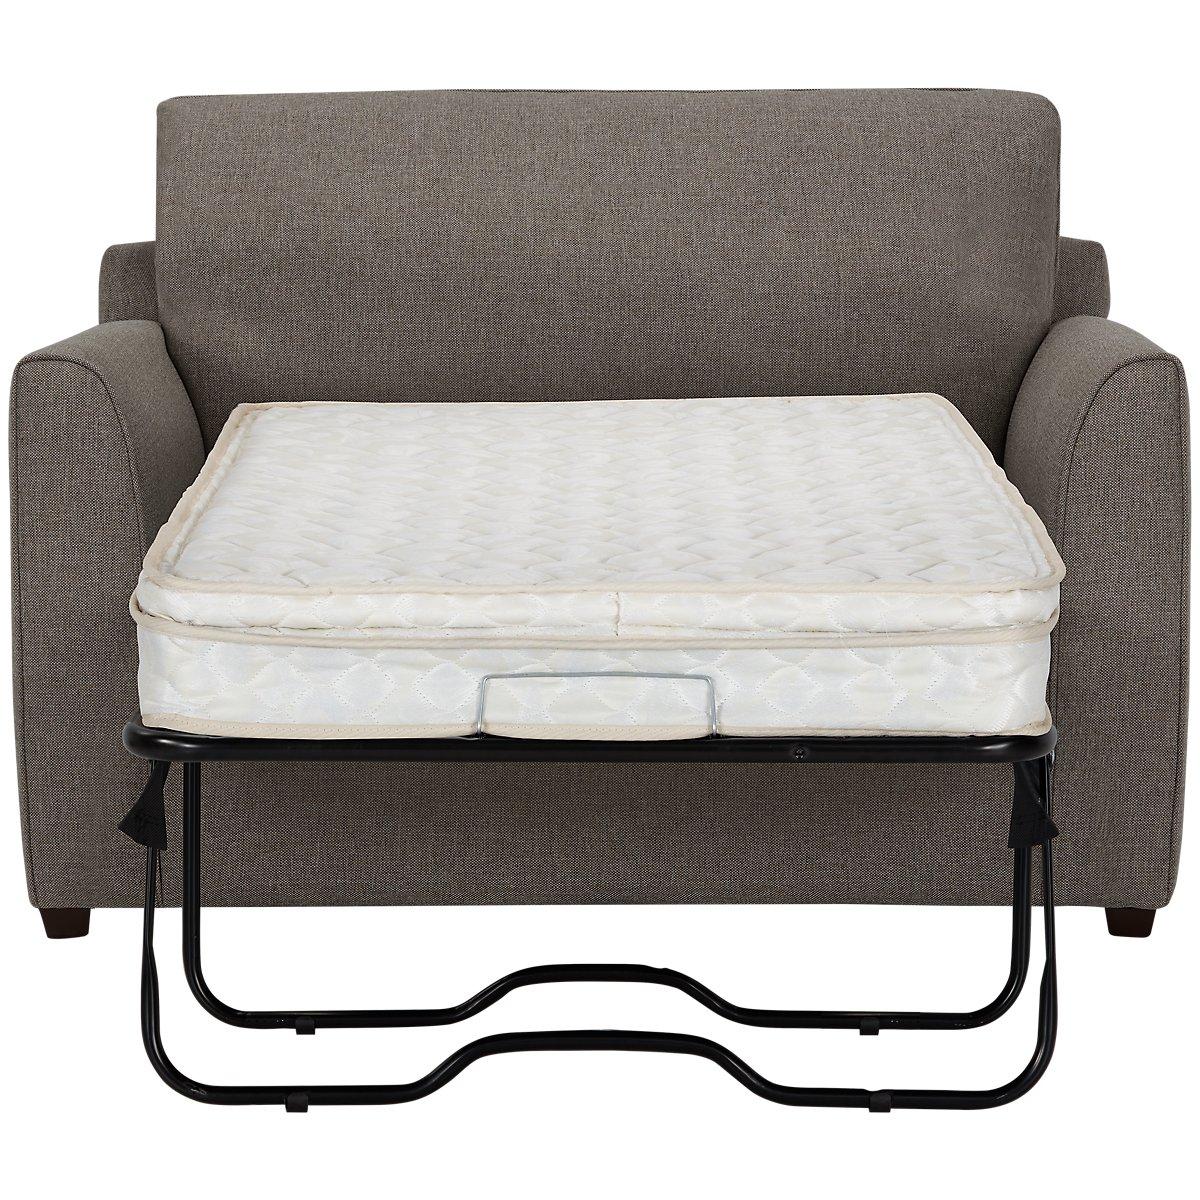 Asheville Brown Fabric Innerspring Sleeper